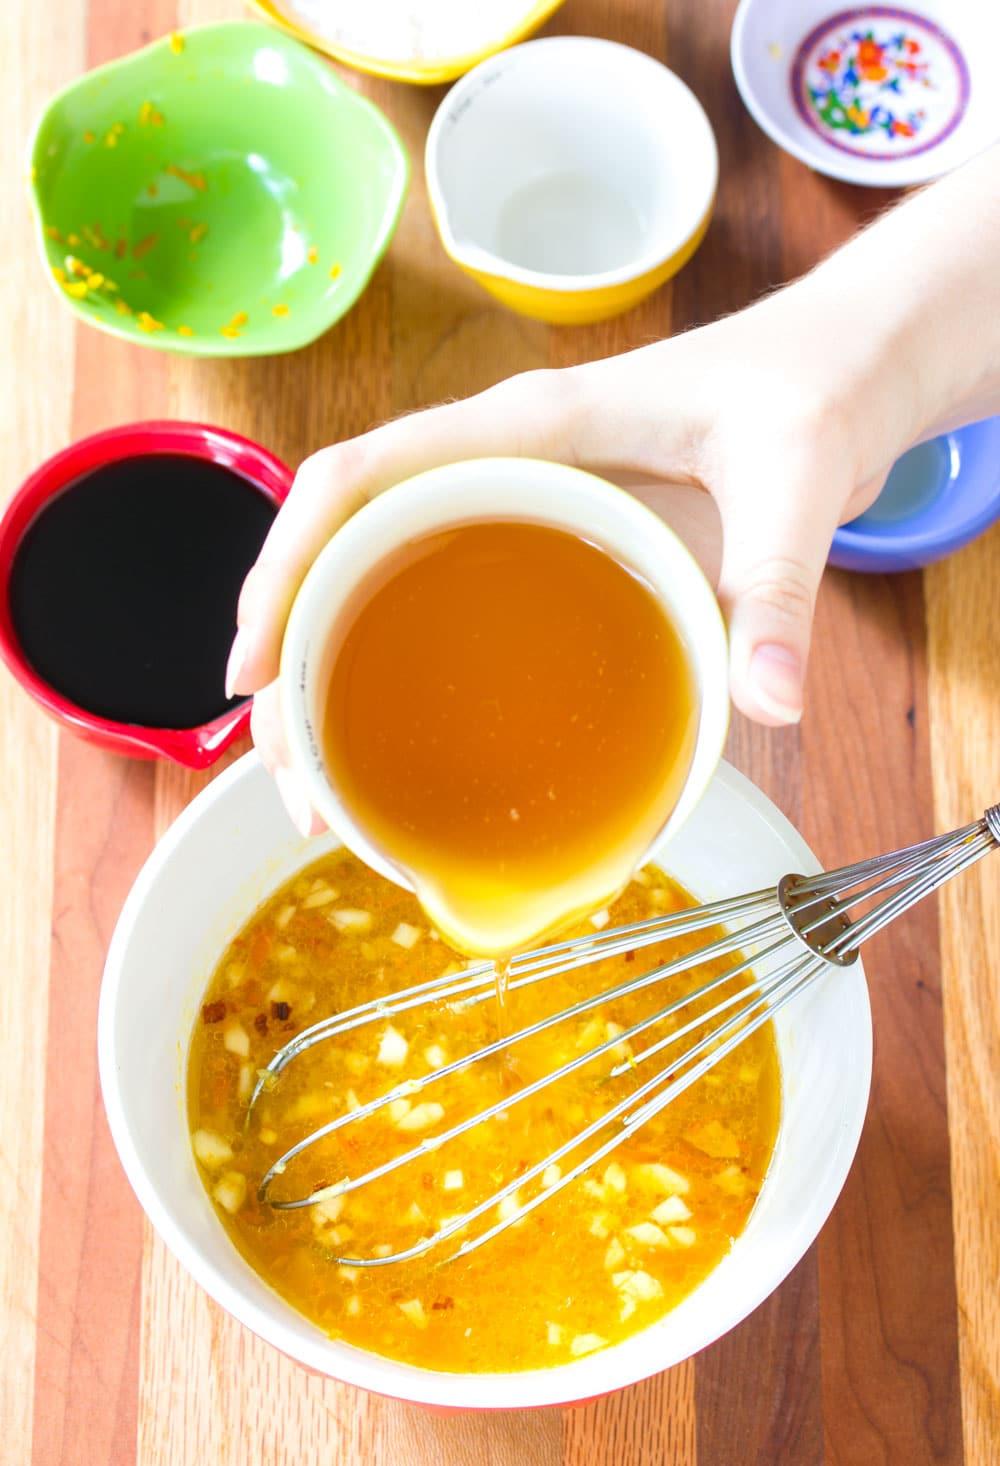 How To Make Skinny Chinese Orange Chicken Recipe #ASpicyPerspective